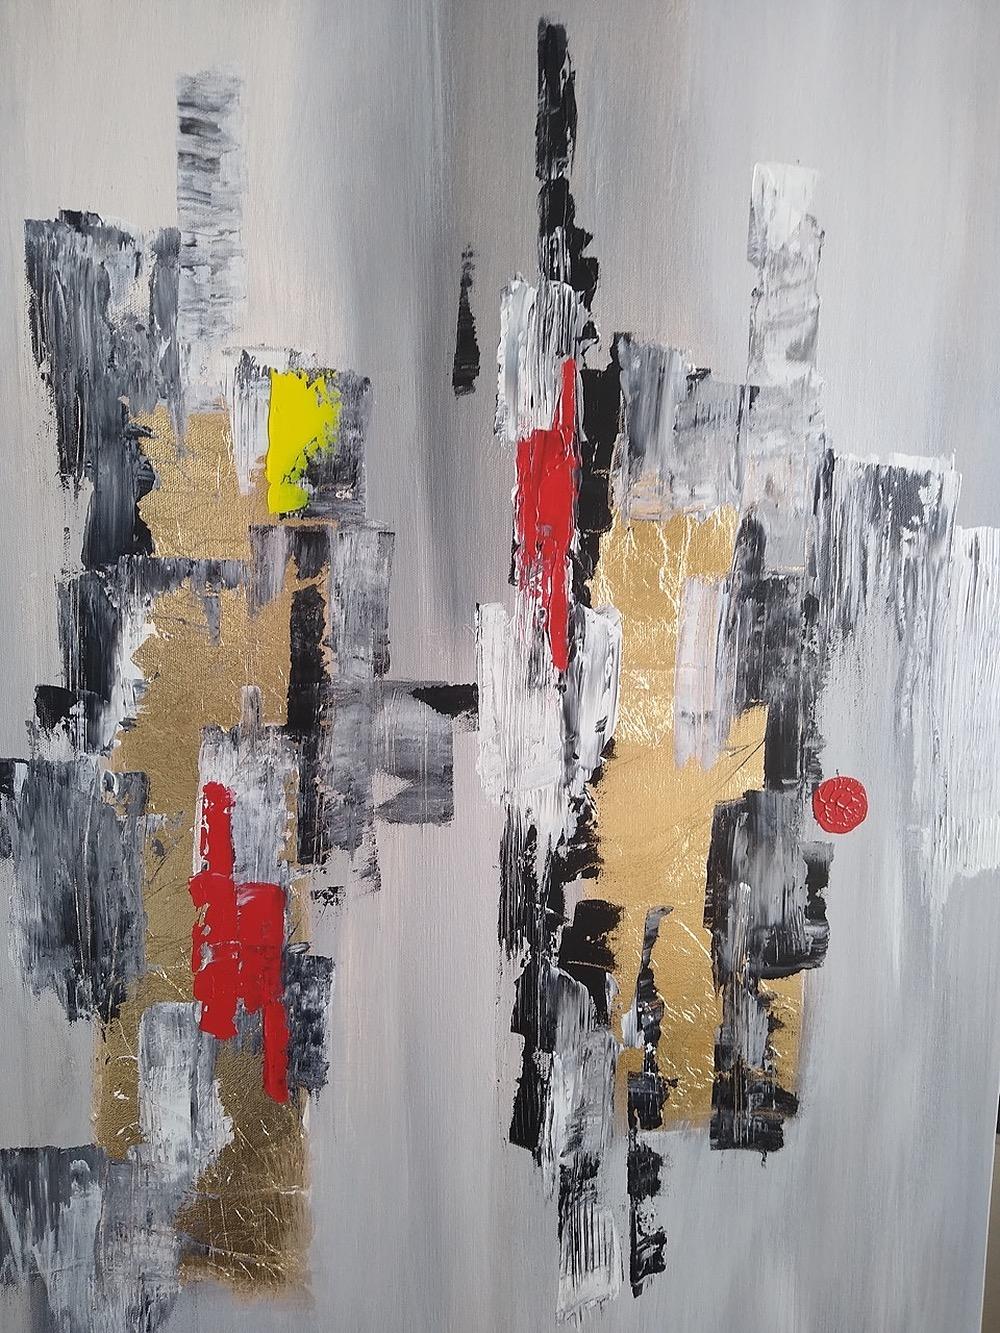 Reflection by Helene Strebel | ArtworkNetwork.com